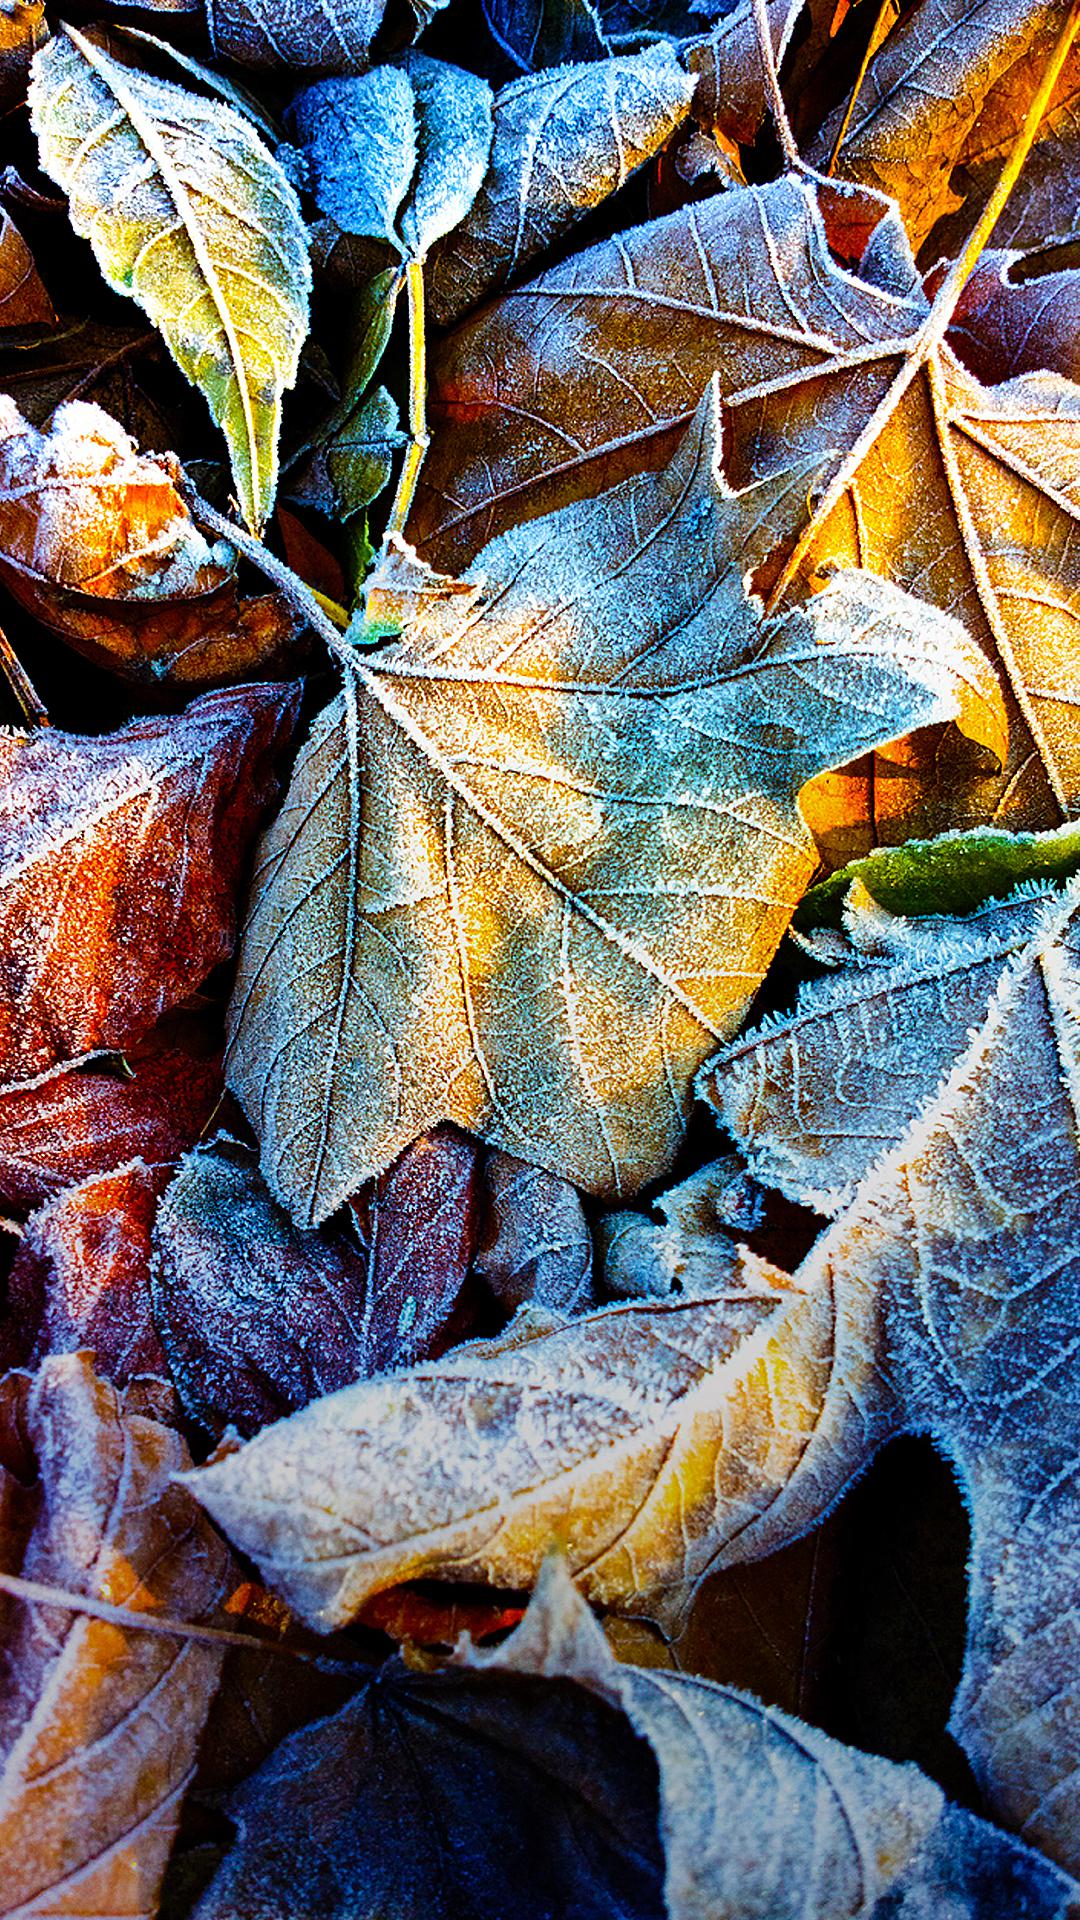 Full Hd Nokia Lumia 1520 Wallpapers on Autumn Word Search